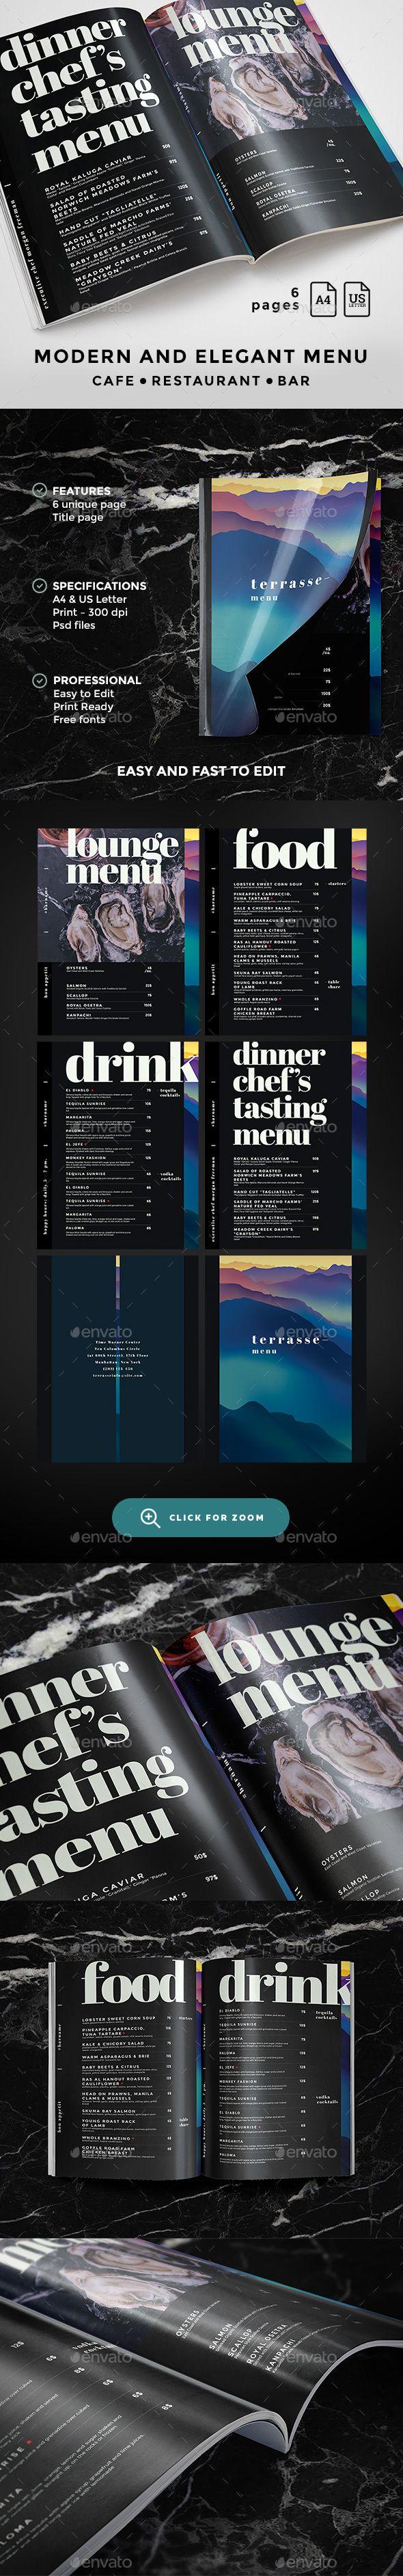 20 best menukarte images on pinterest food menu template print